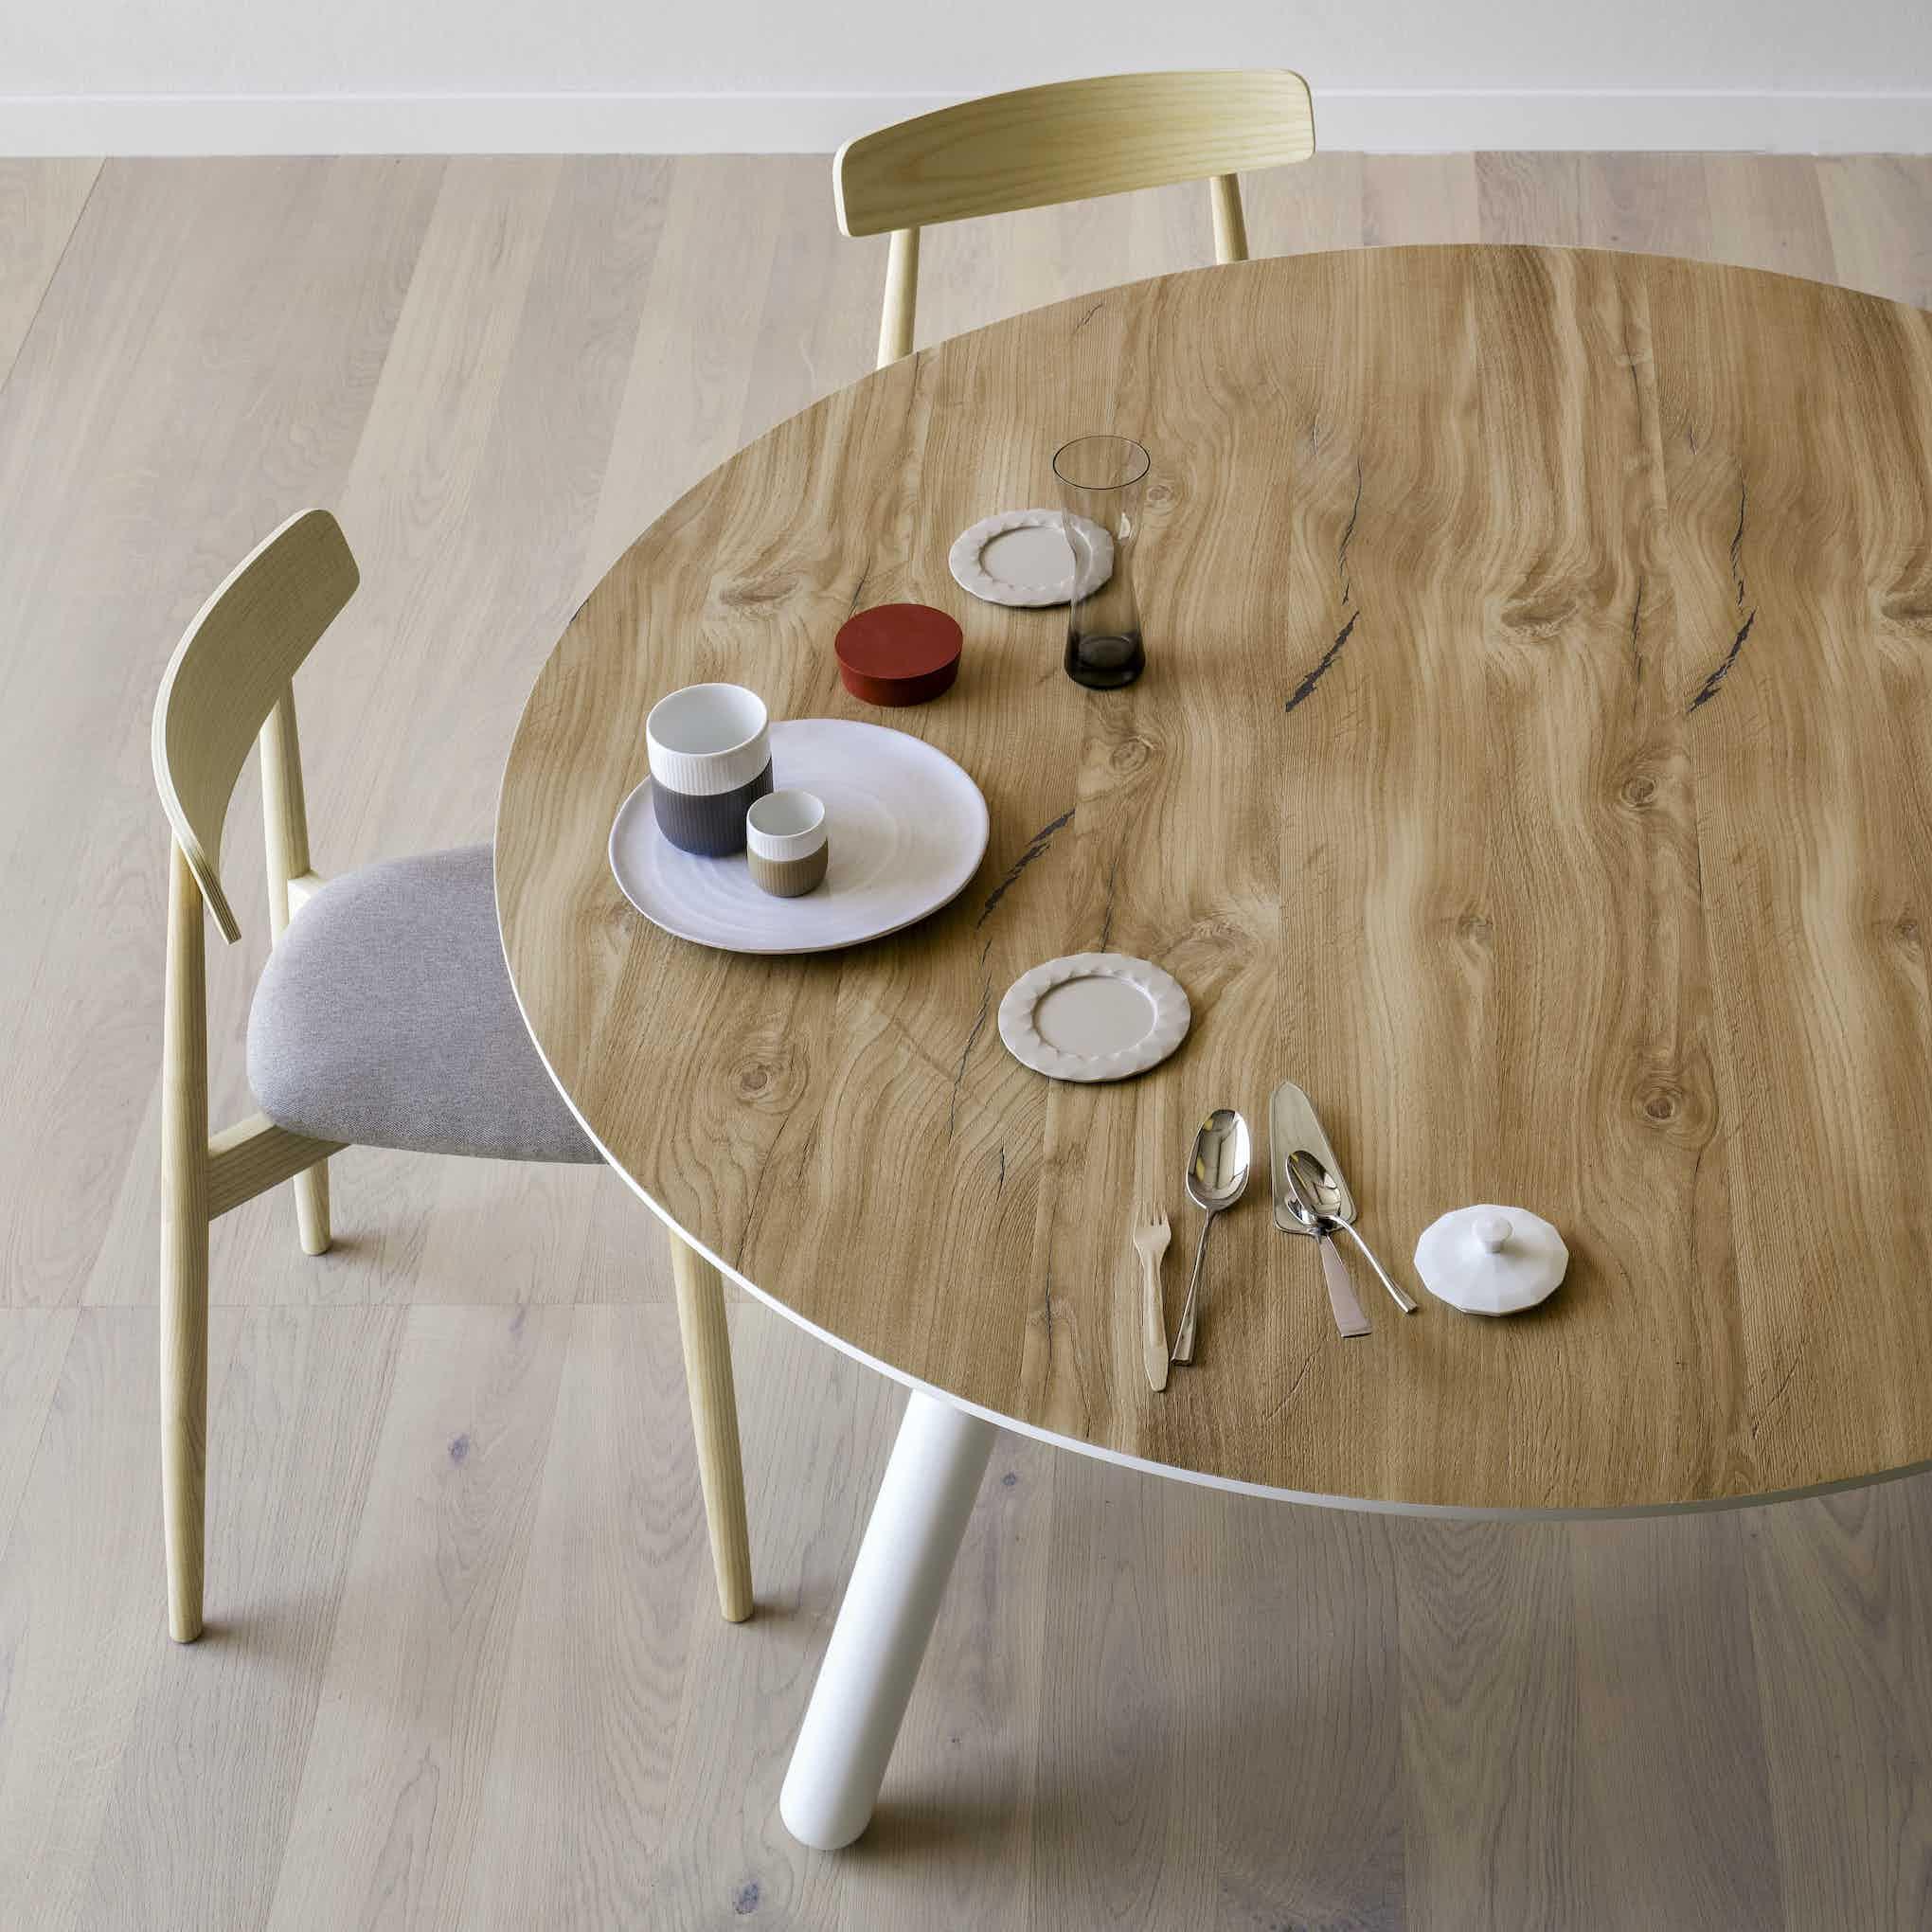 Miniforms Pixie Table Overhead Haute Living